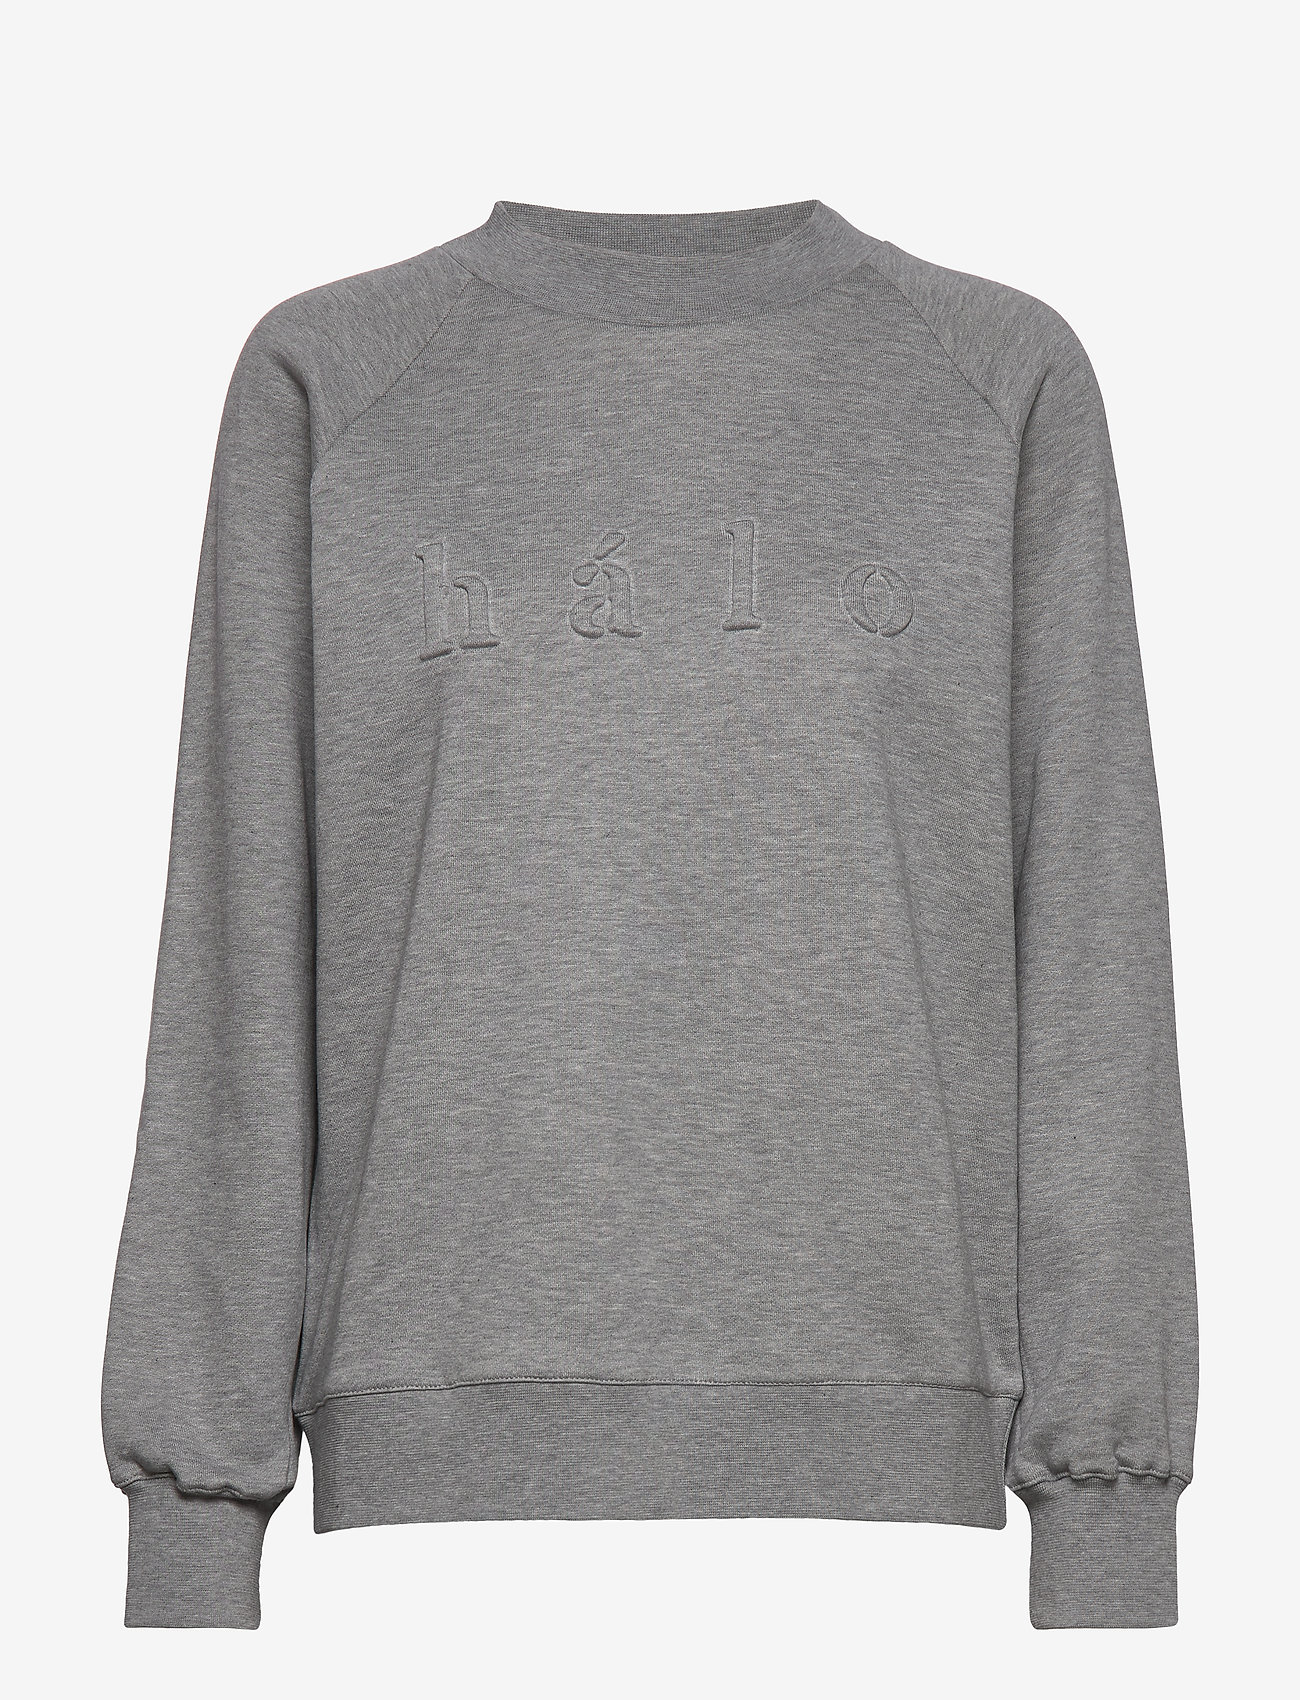 hálo - KAJO college - sweatshirts - grey - 0